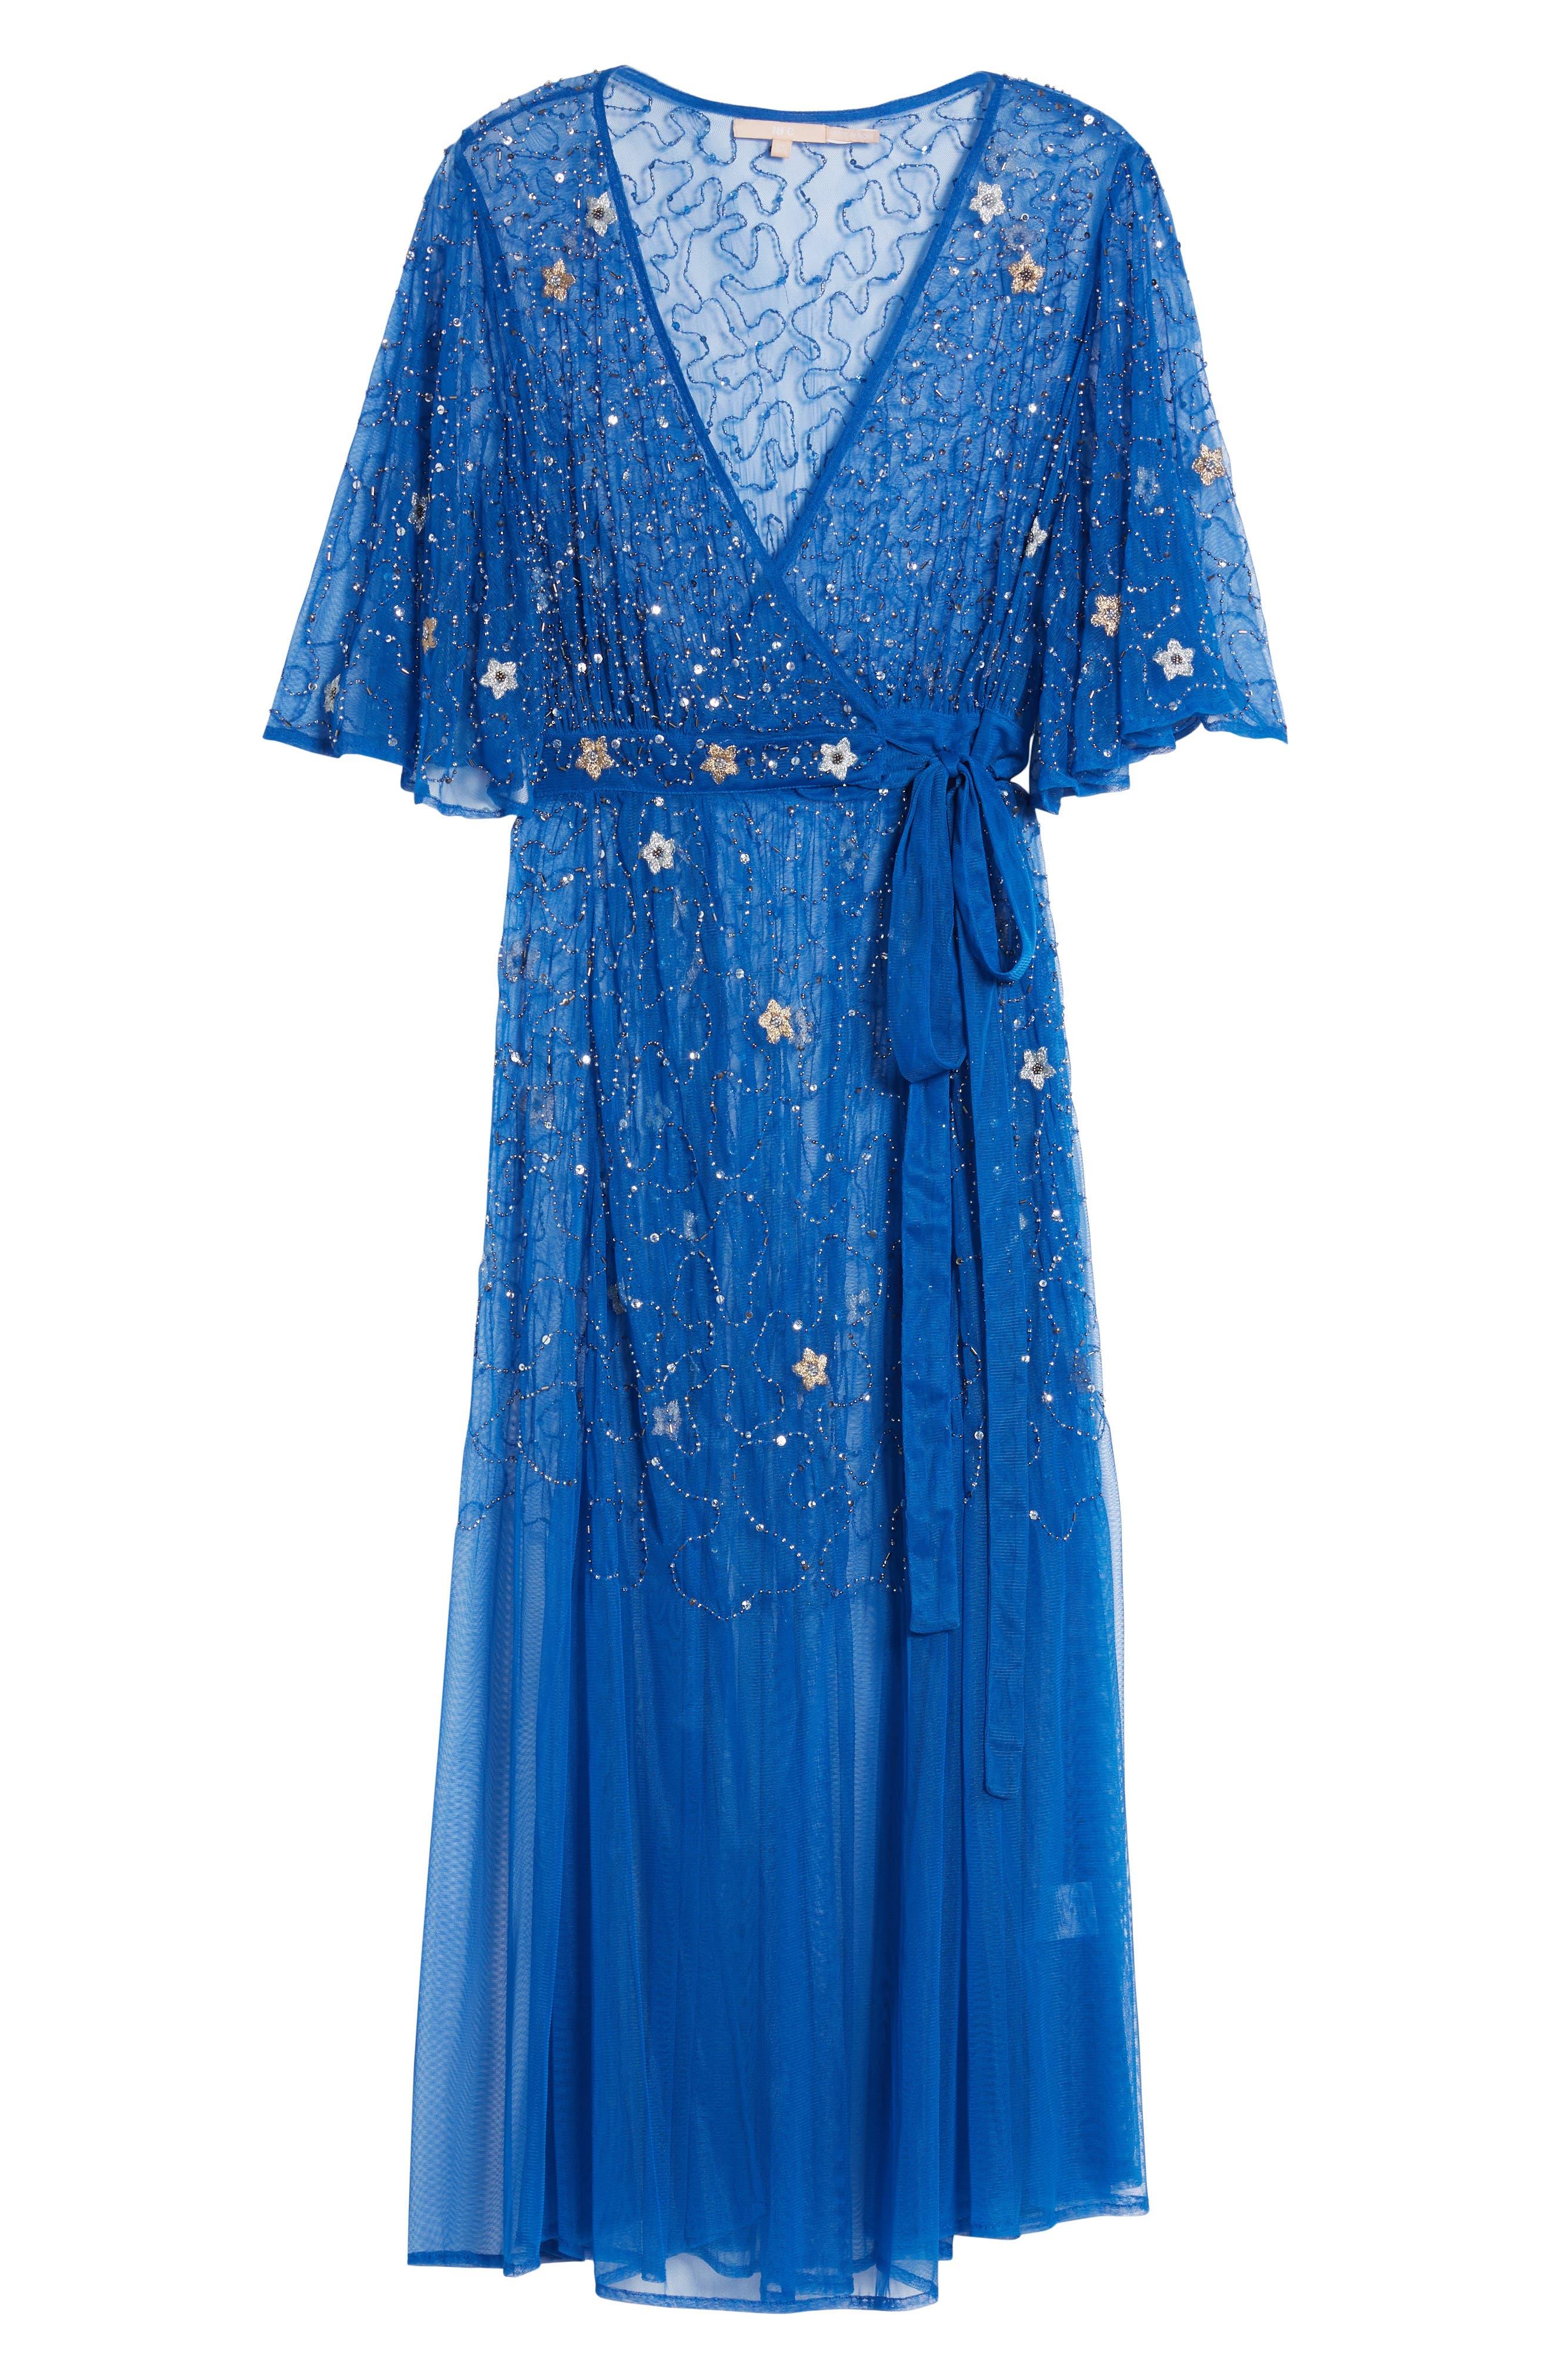 Stargazer Kimono,                             Alternate thumbnail 6, color,                             LAPIZ BLUE